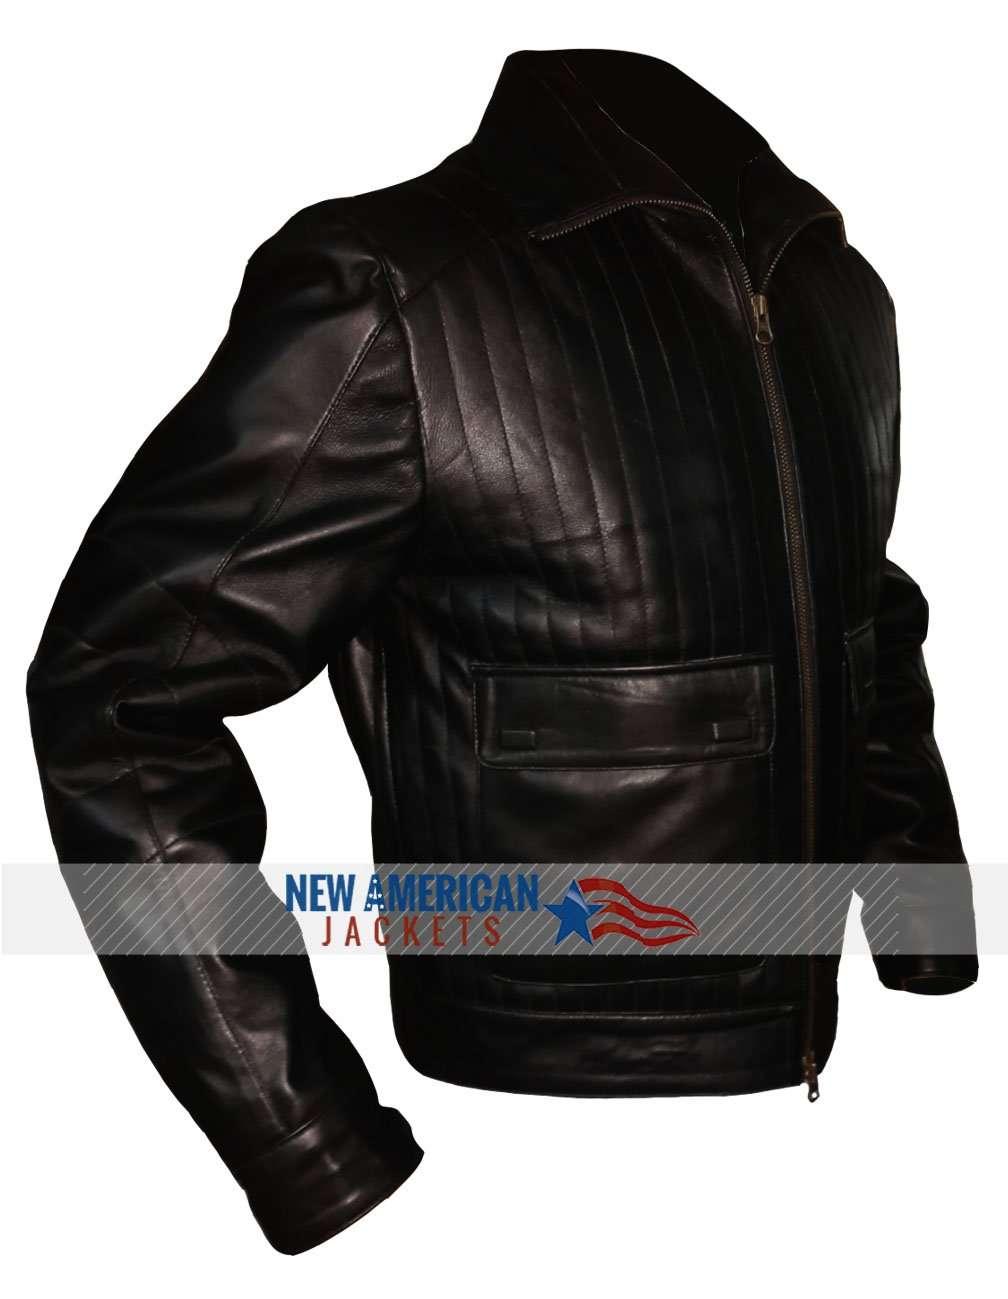 Leather Jacket Halloween Costume